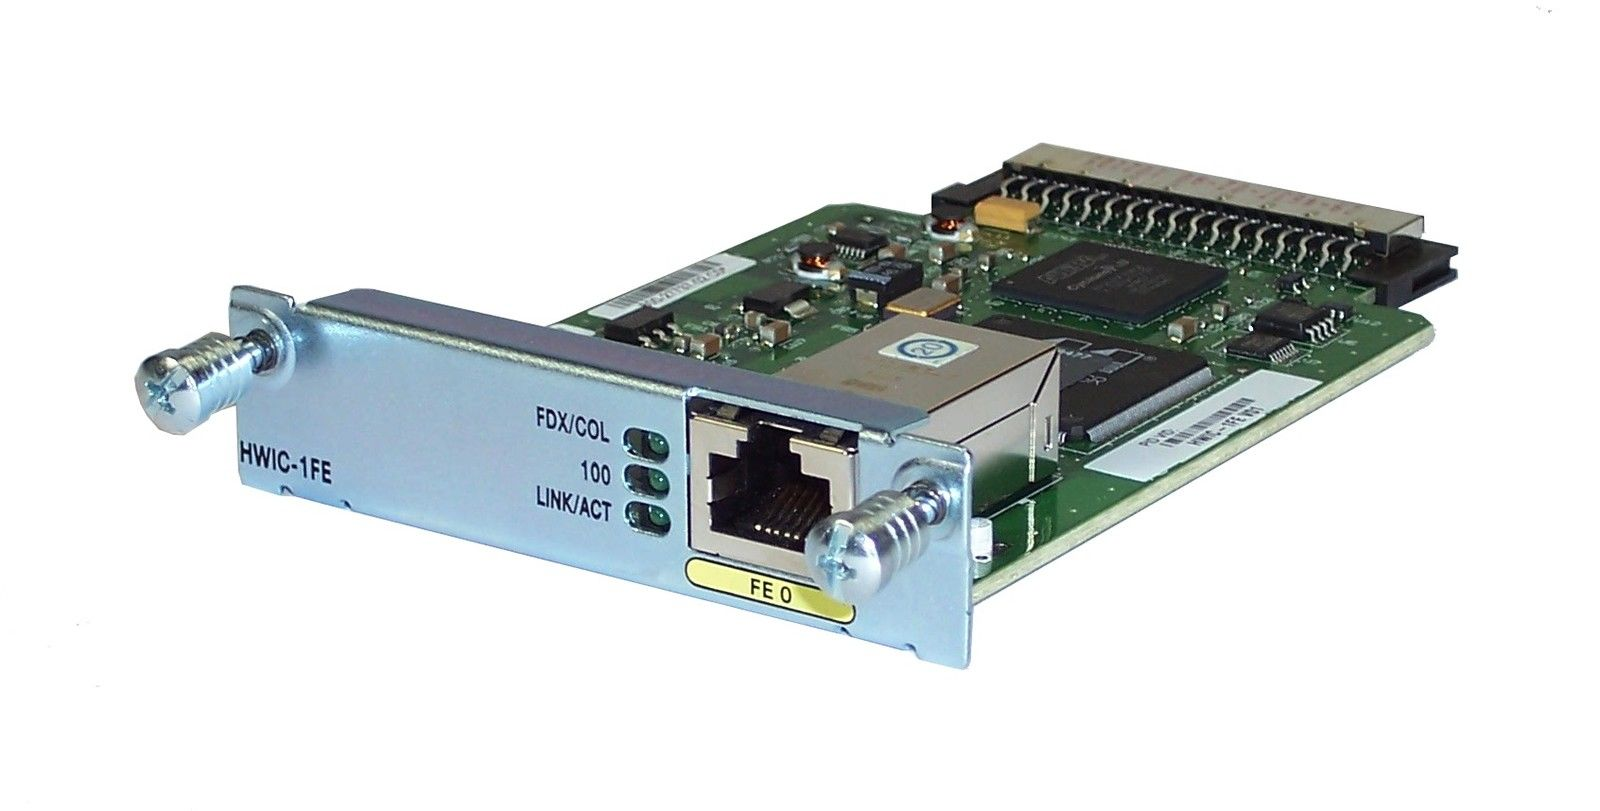 Original HWIC-1FE Router 1 Ethernet Port Module